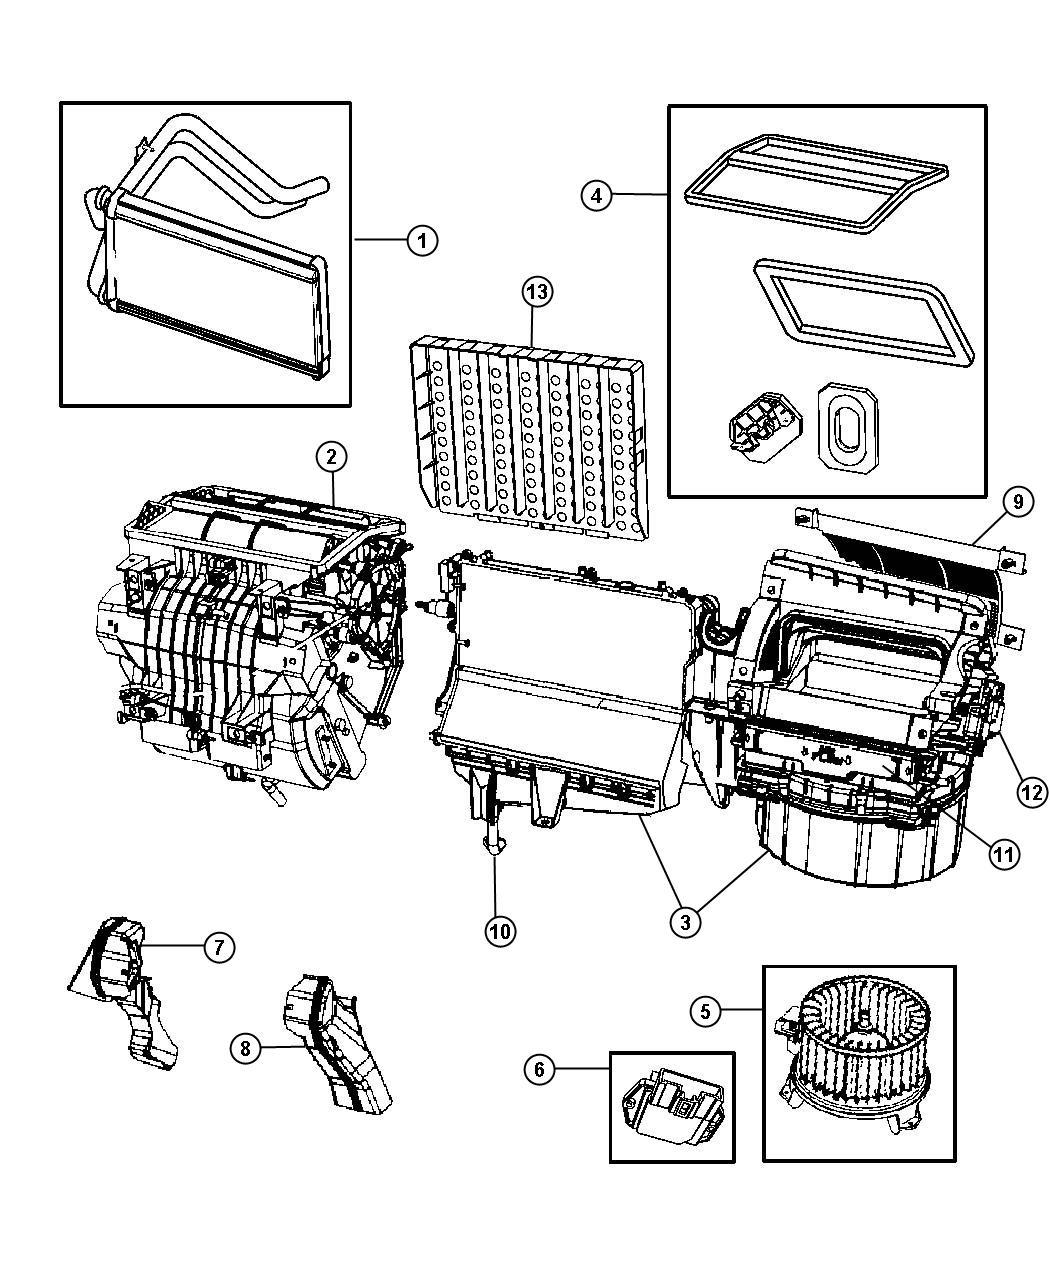 2011 Jeep Wrangler Actuator  Blend Door  A  C And Heater